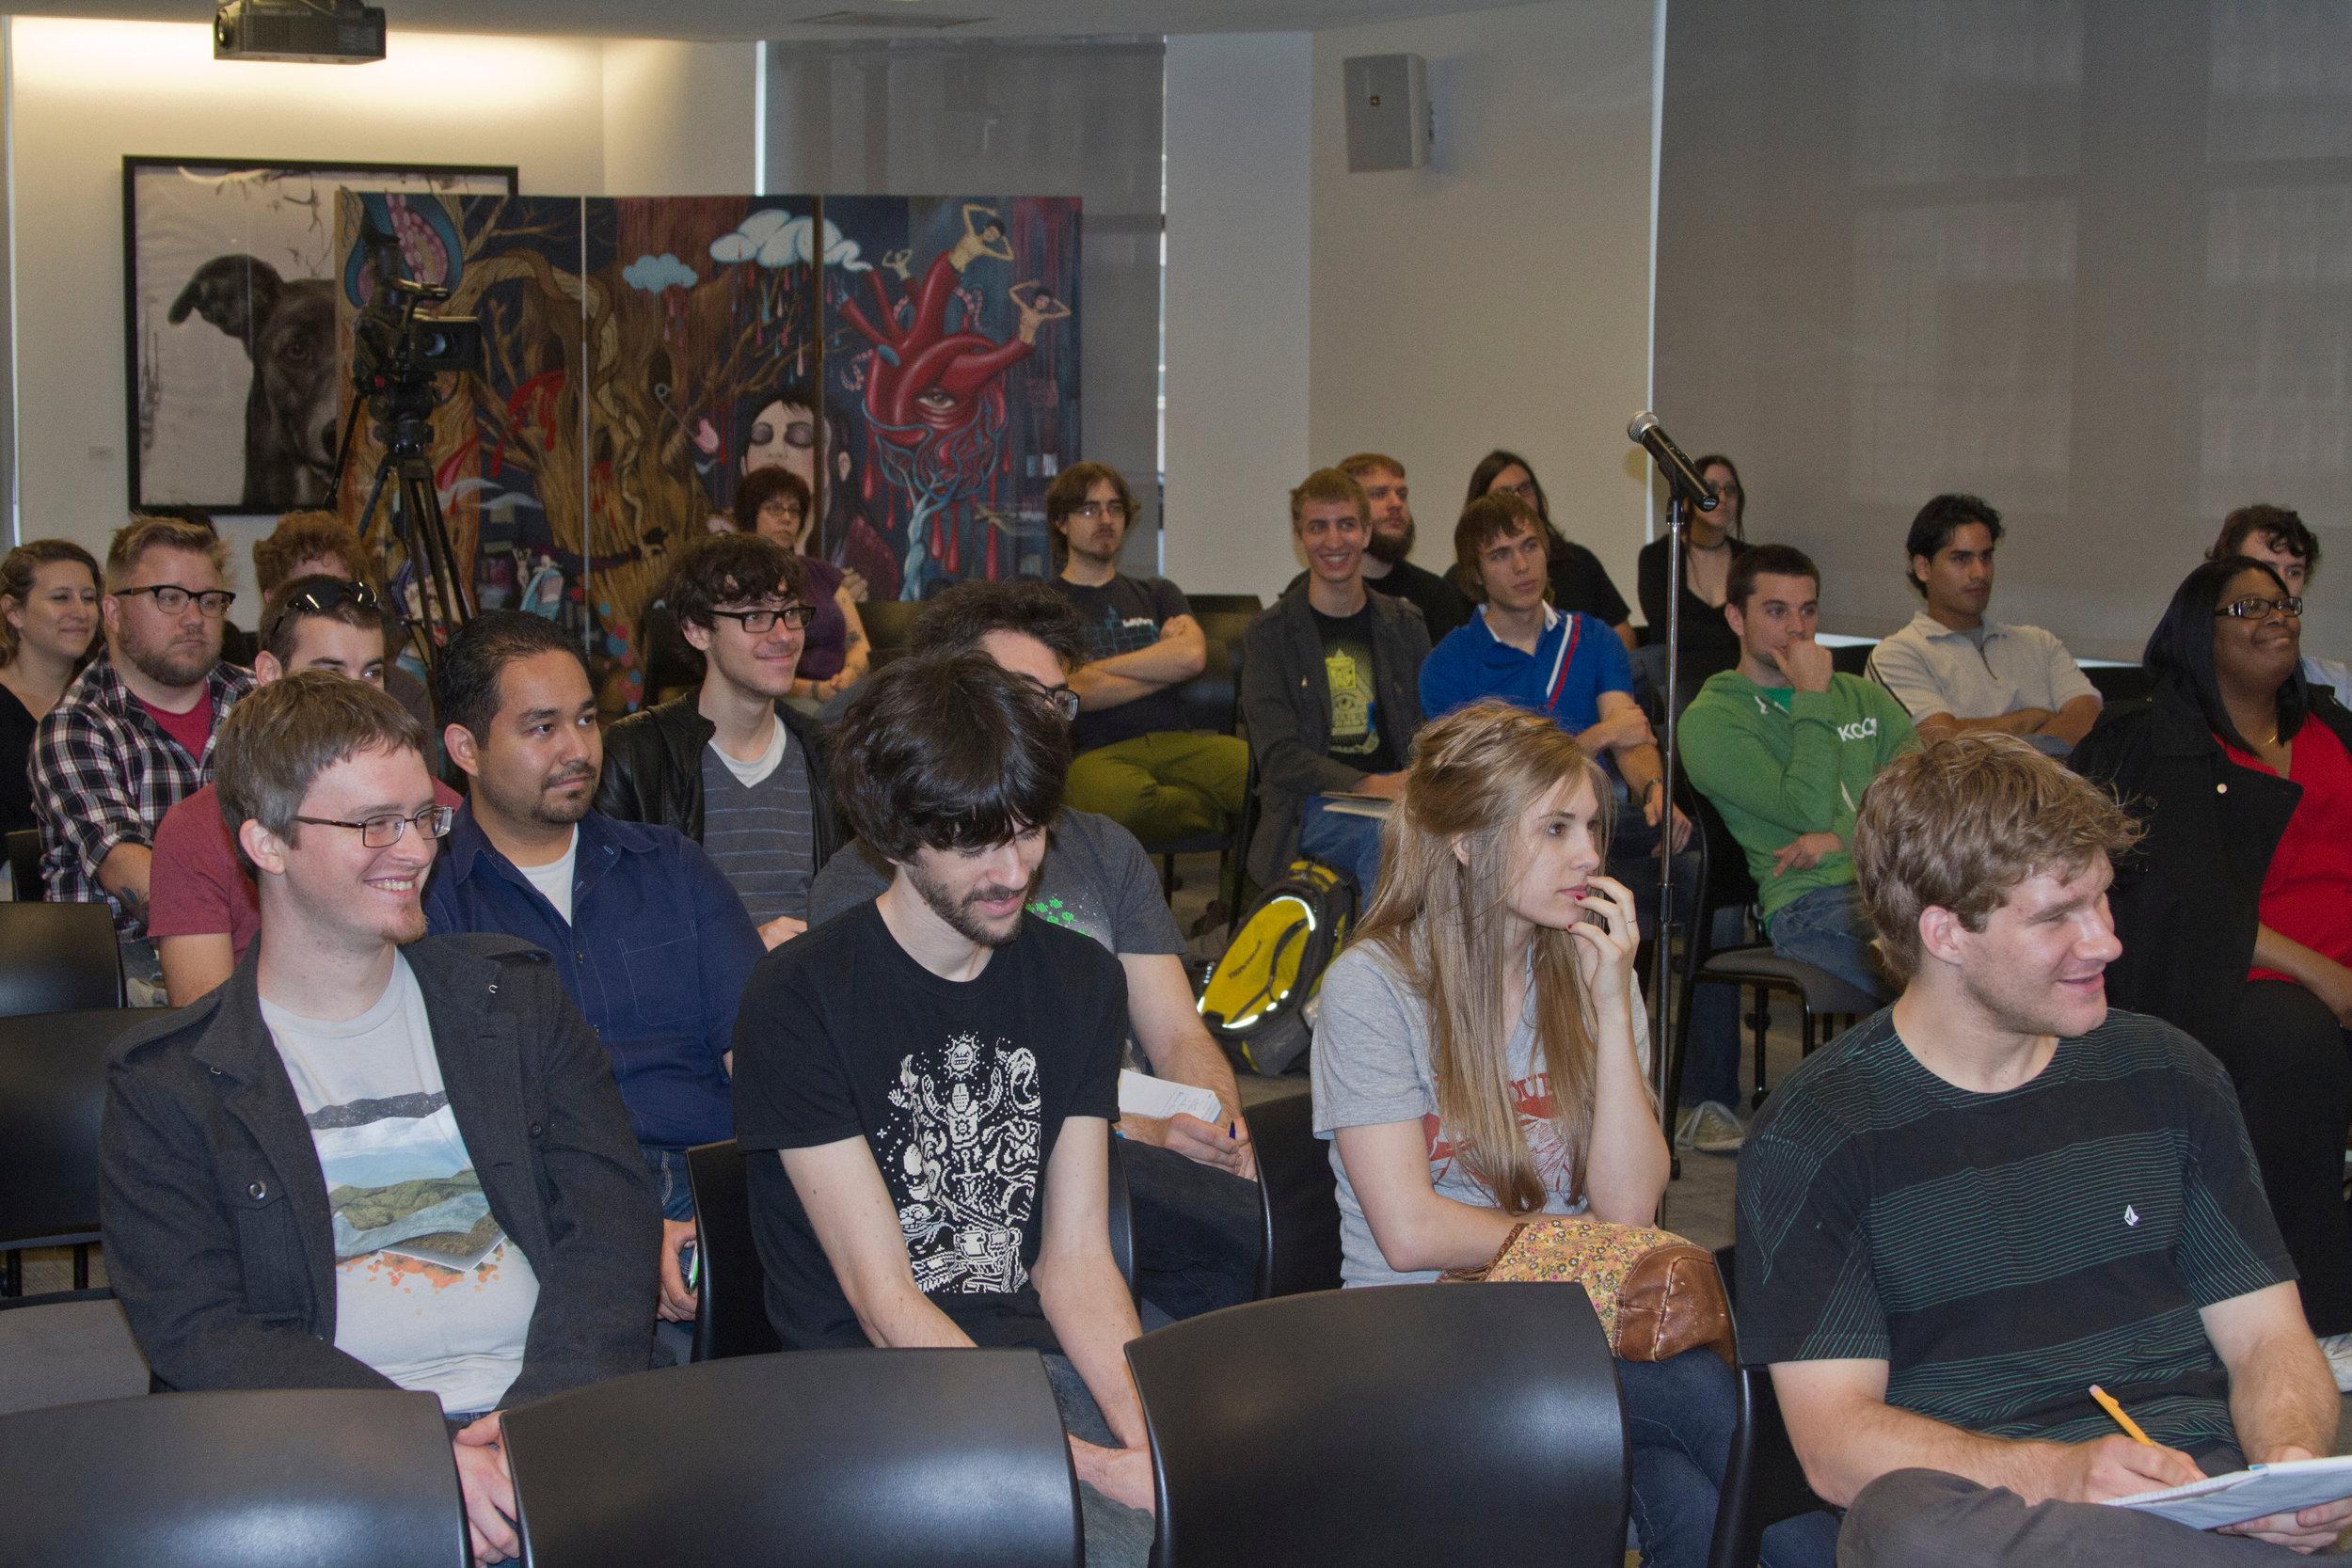 more-audience_9387119190_o.jpg